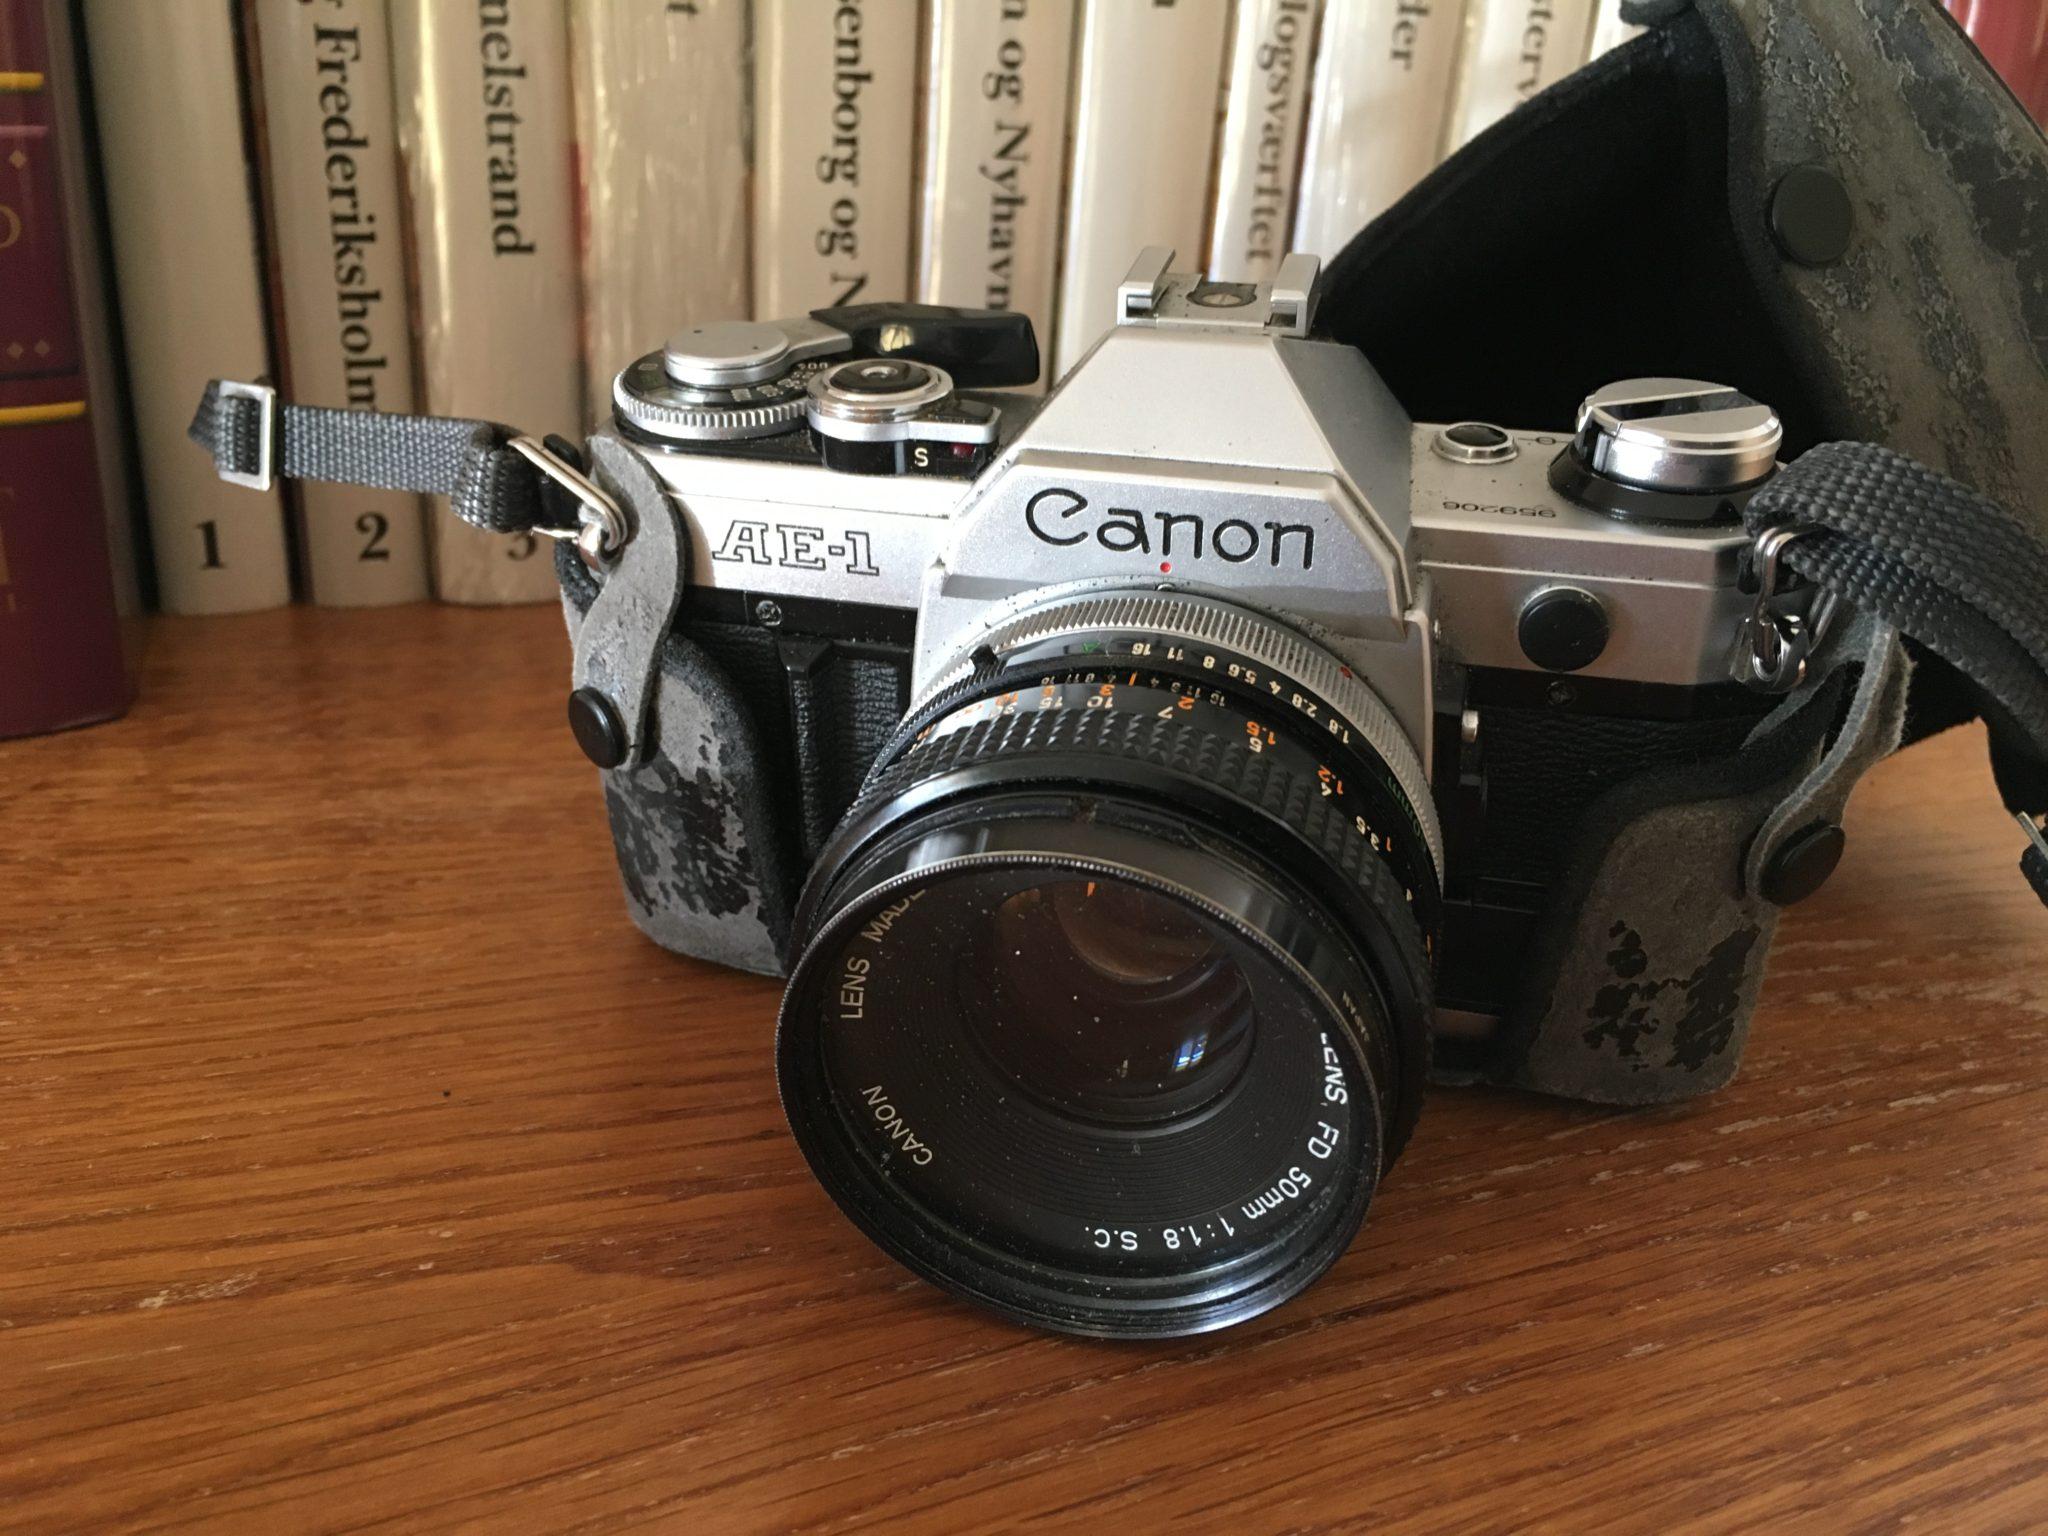 Canon AE-1, pris 300 kr